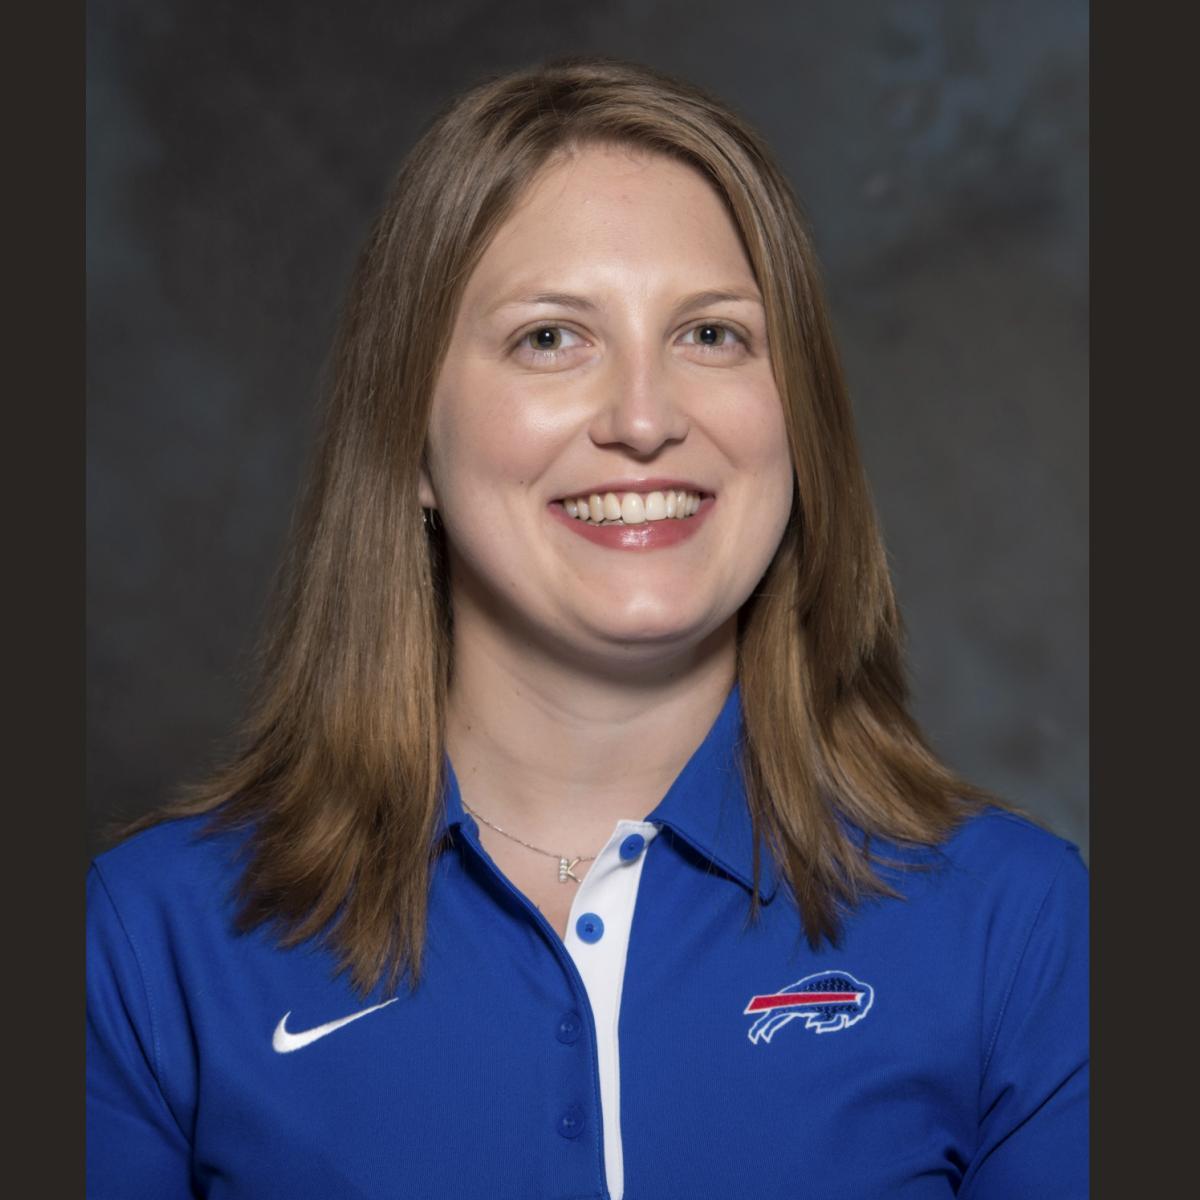 Kathryn Smith Komentar Menjadi Pelatih Penuh Waktu Wanita Pertama dalam Sejarah NFL | Laporan Bleacher